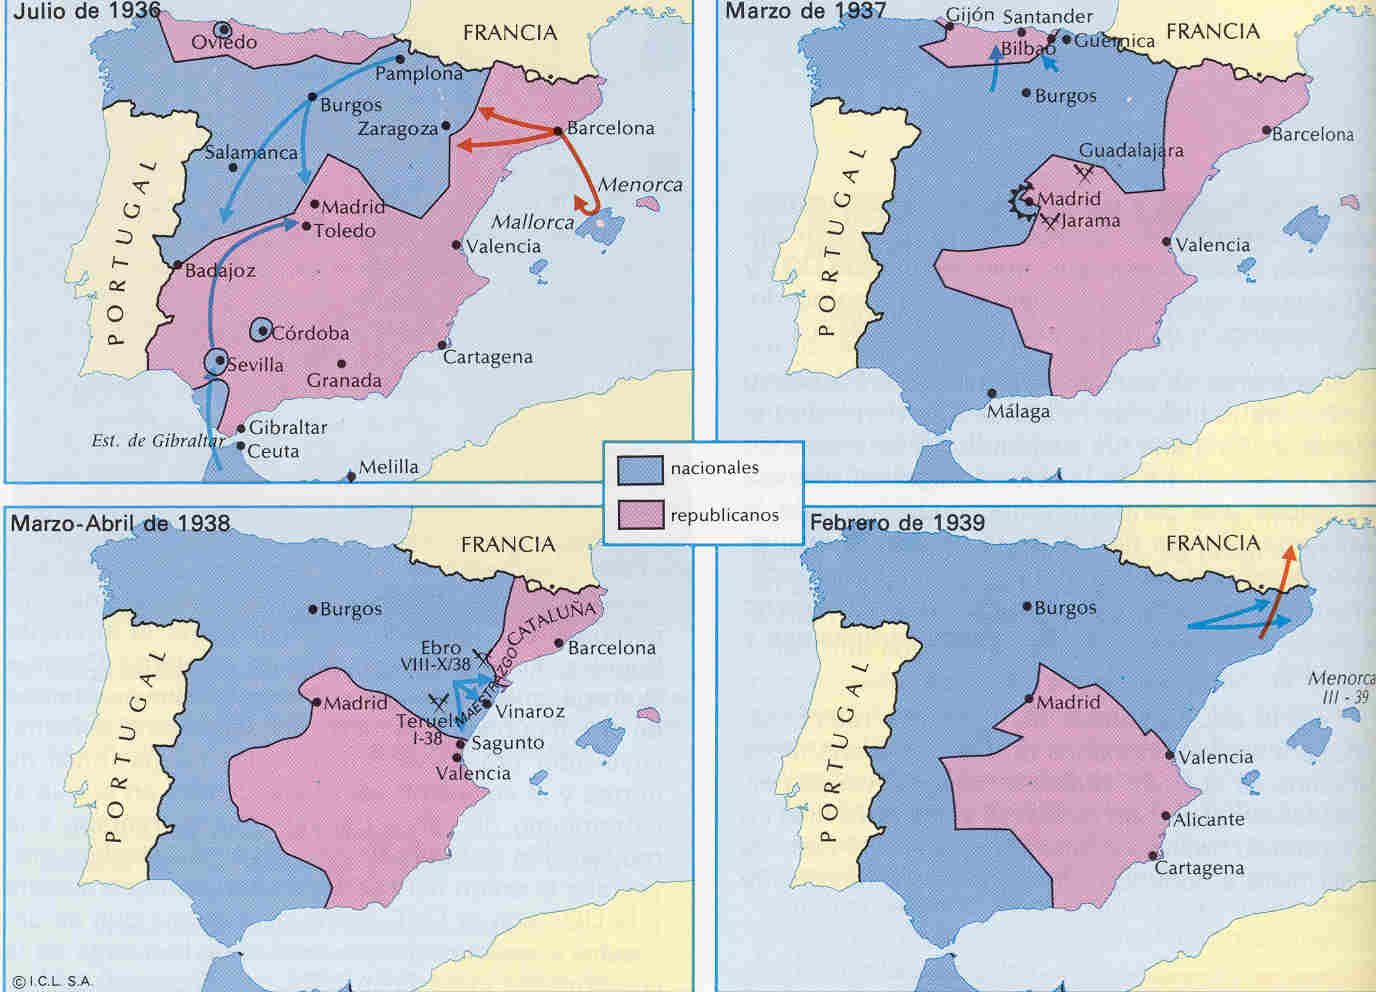 Evolution of the Spanish Civil War 1936-1939